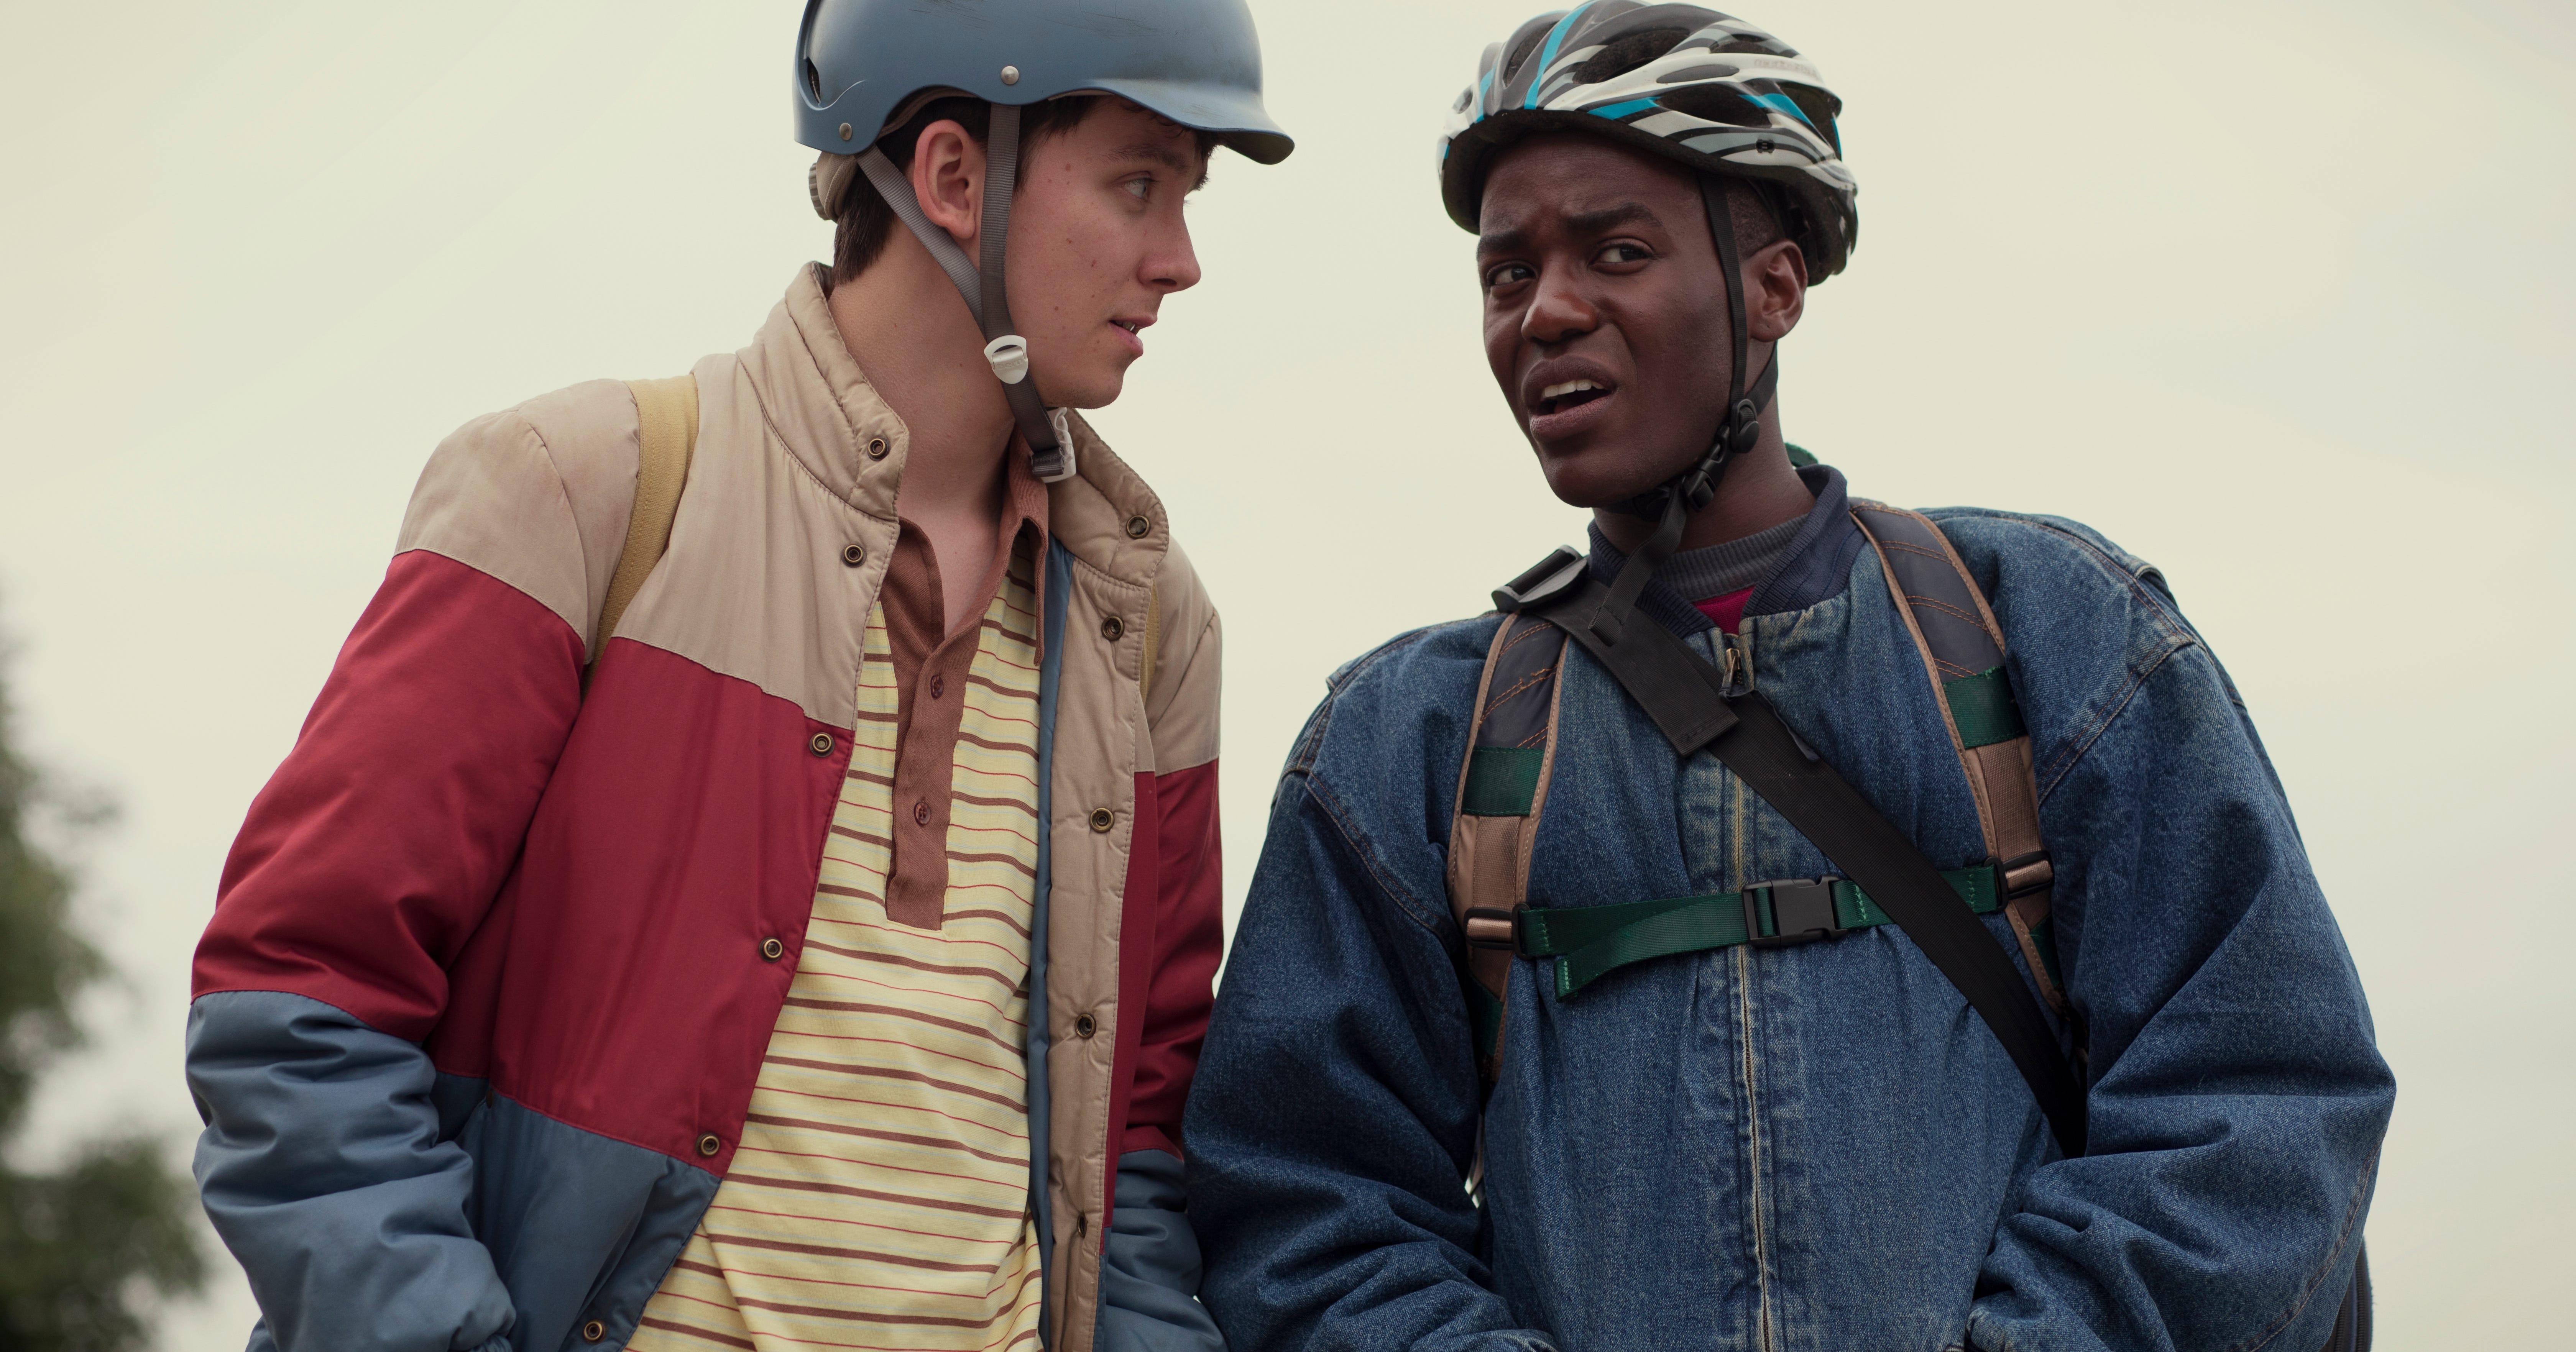 13 Utterly Charming British Comedies On Netflix